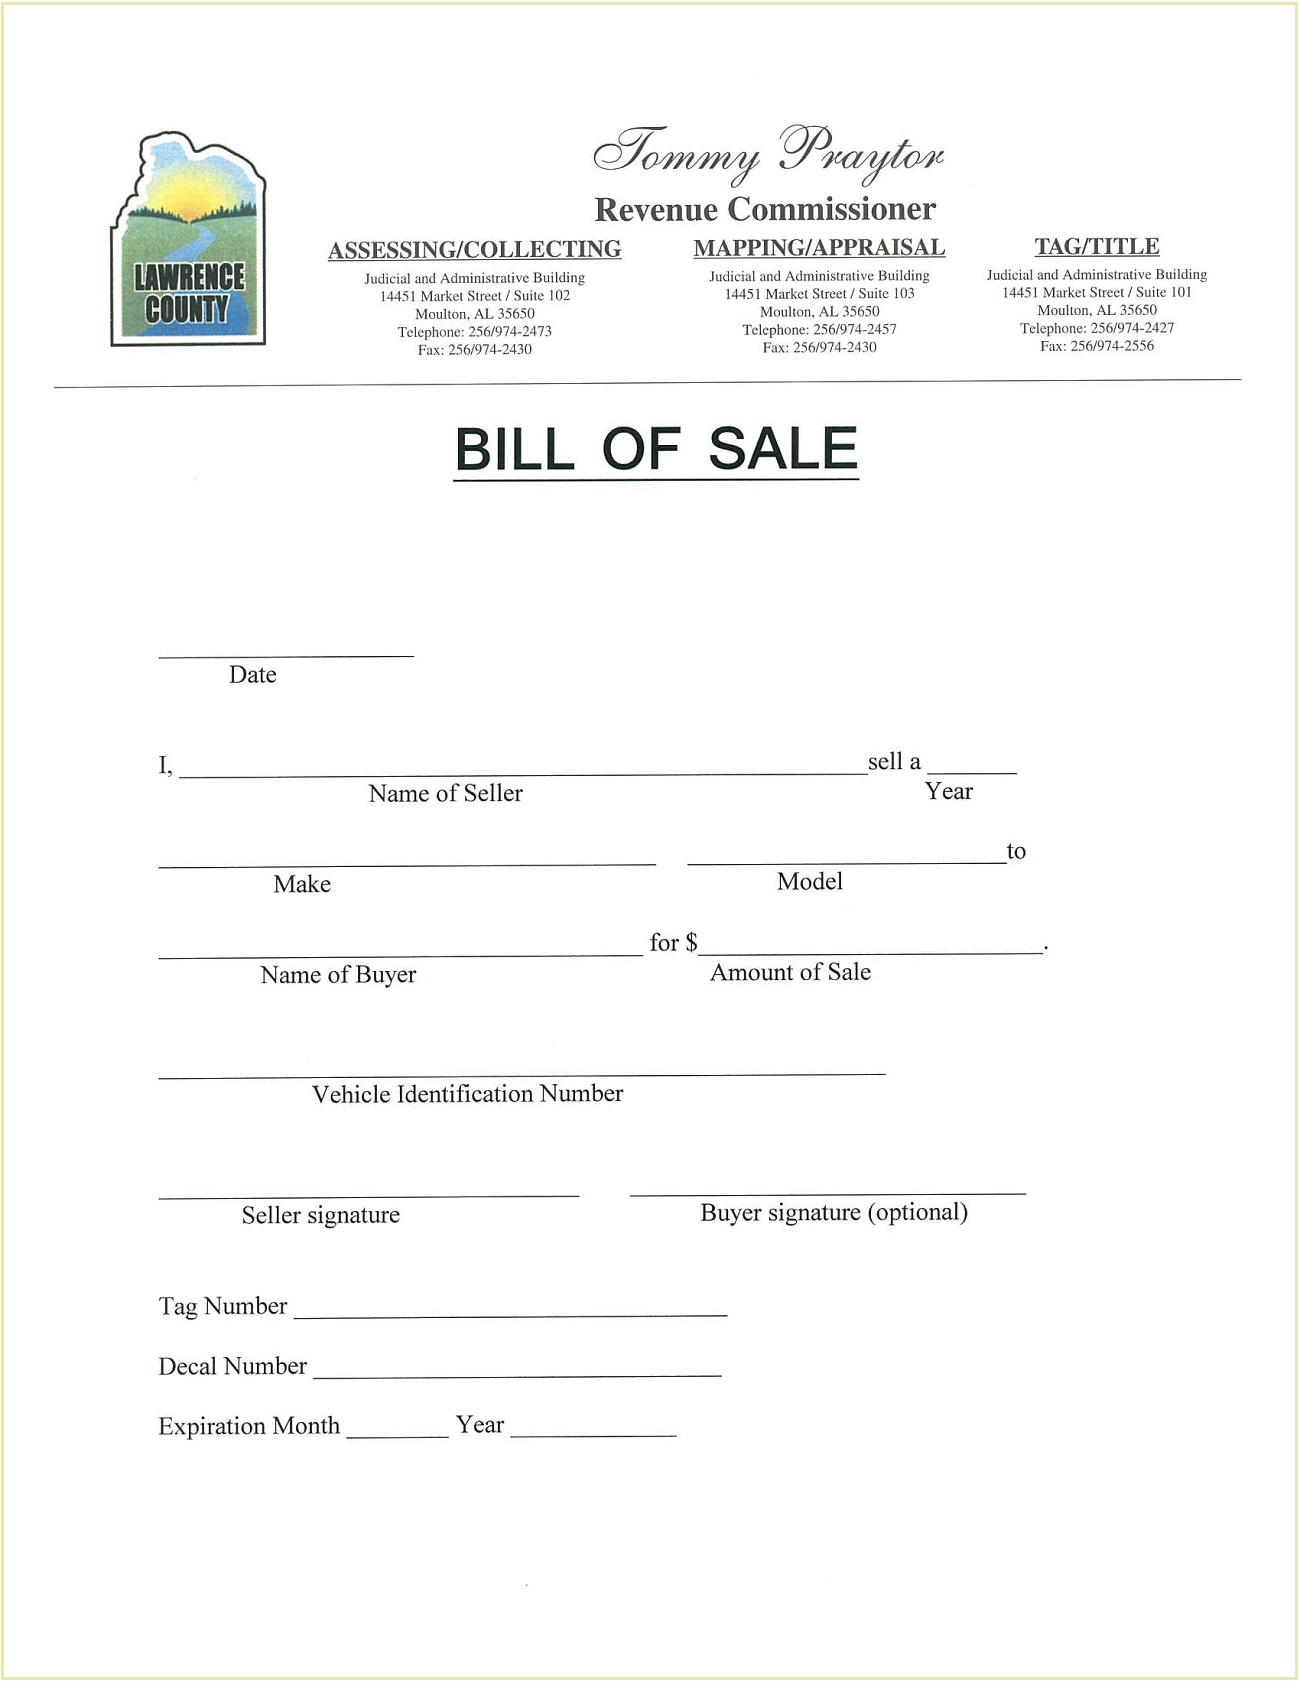 Lawrence County DMV Alabama Motor Vehicle Bill of Sale Form Template PDF